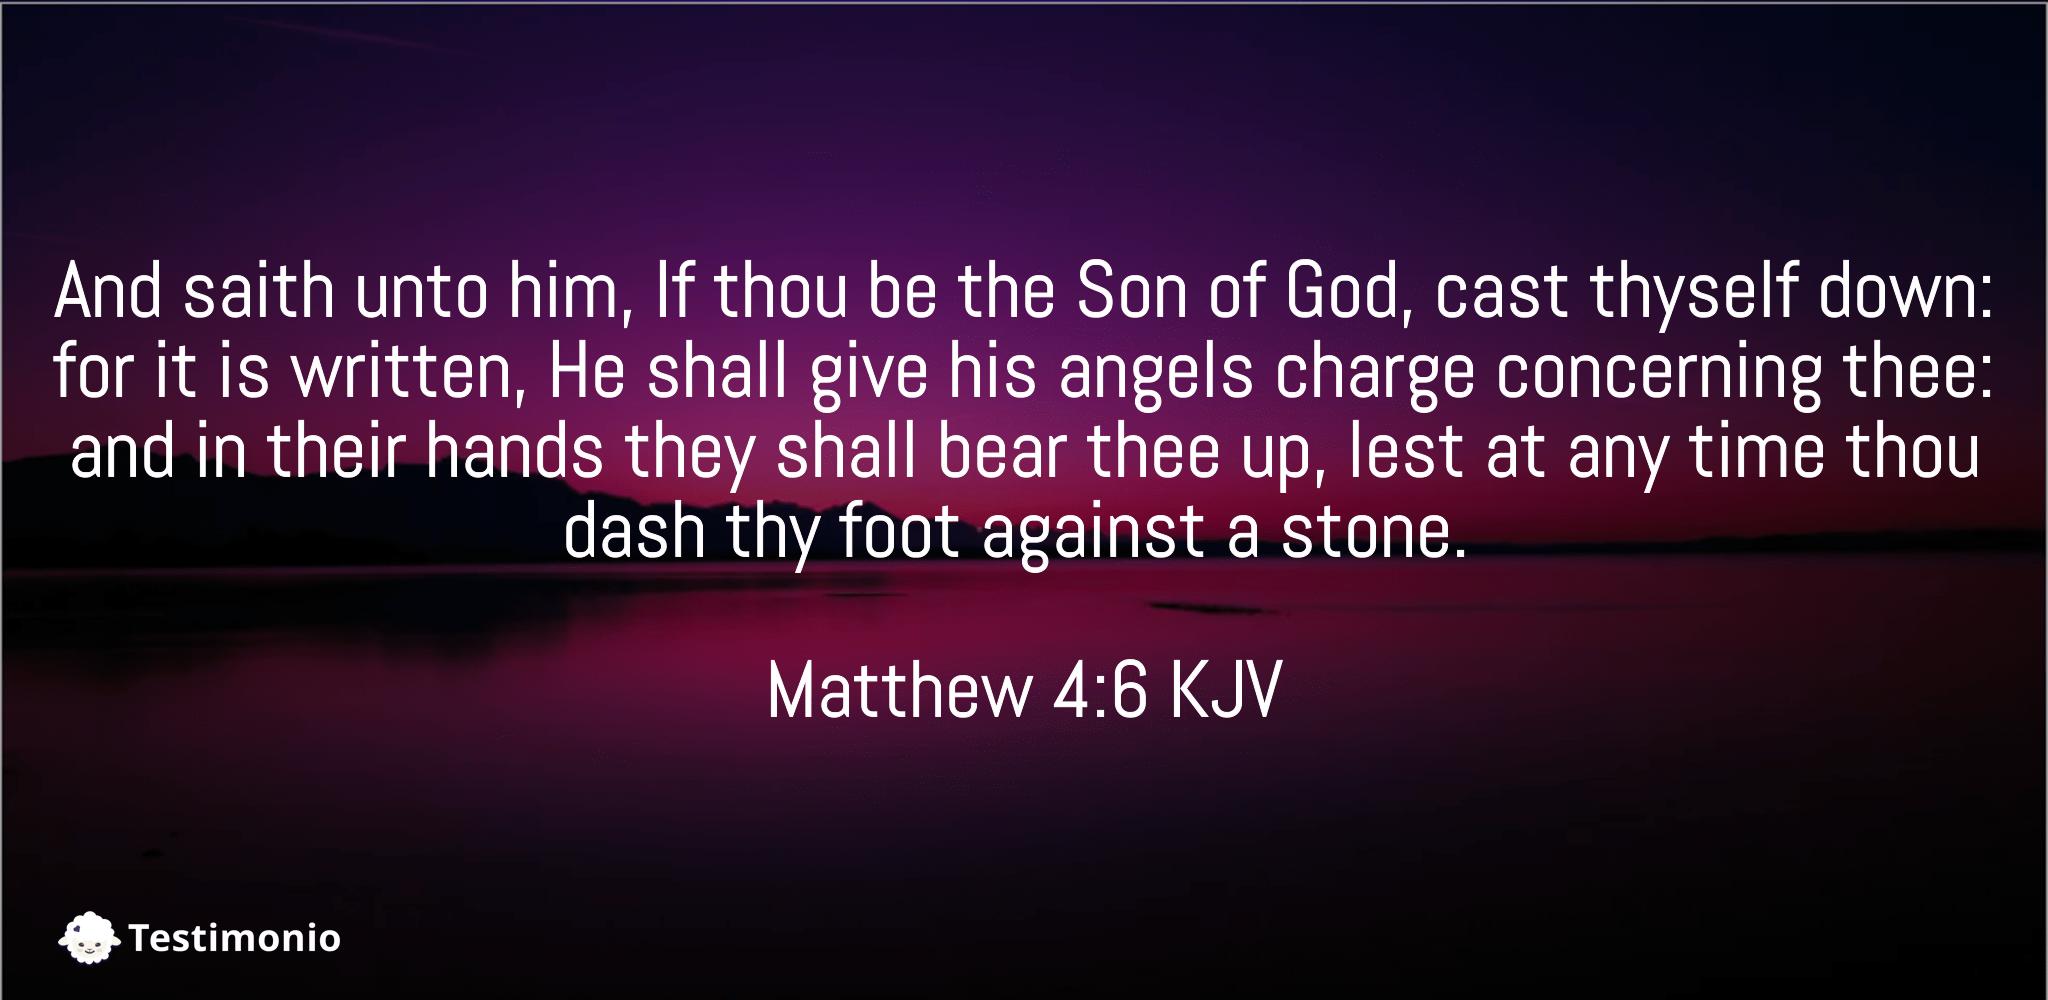 Matthew 4:6